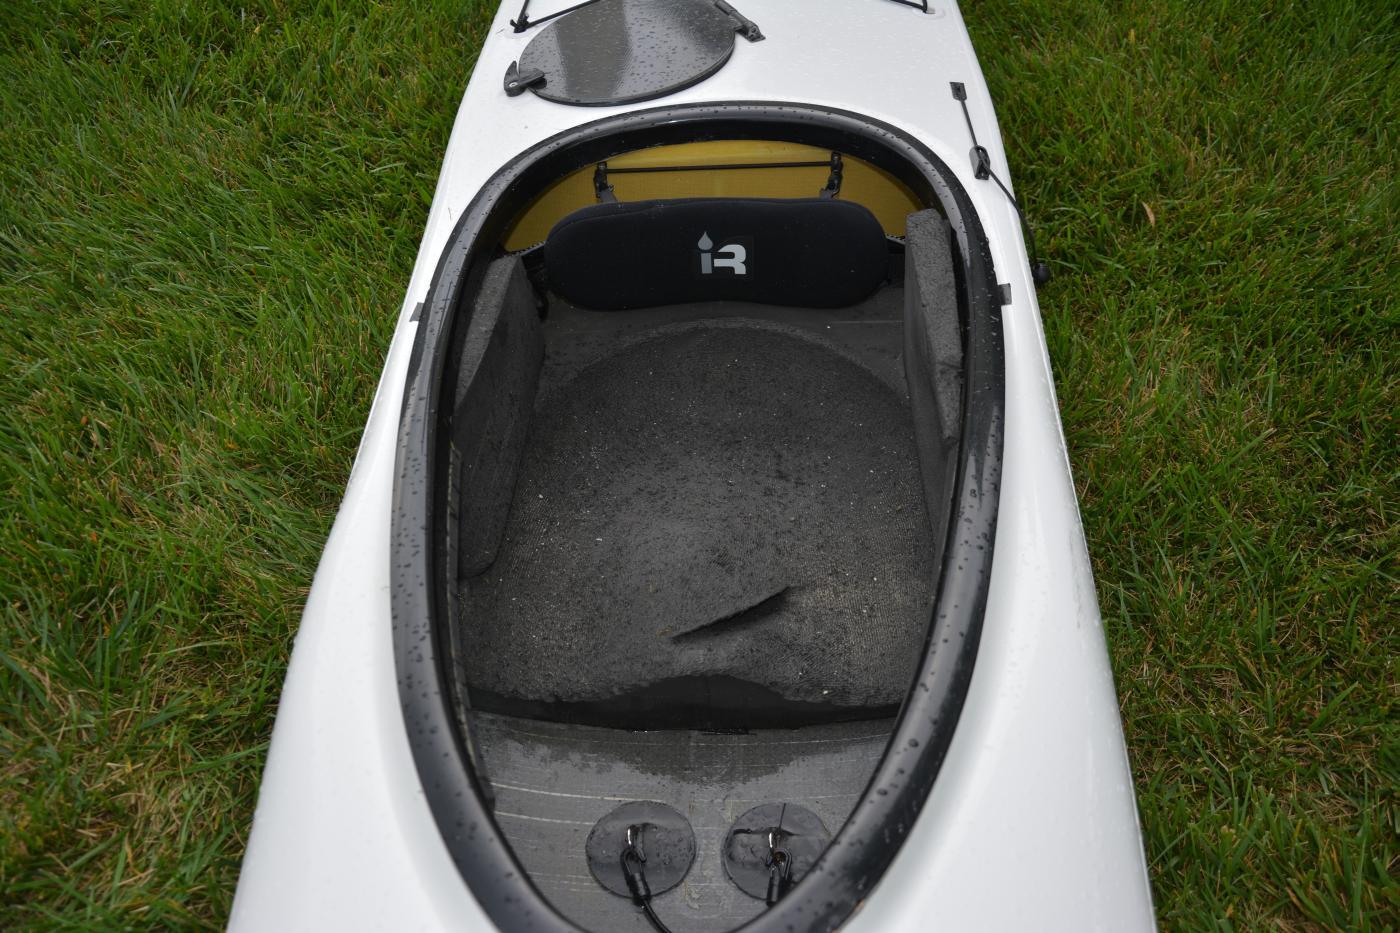 Expdition Kayak Sail Install on